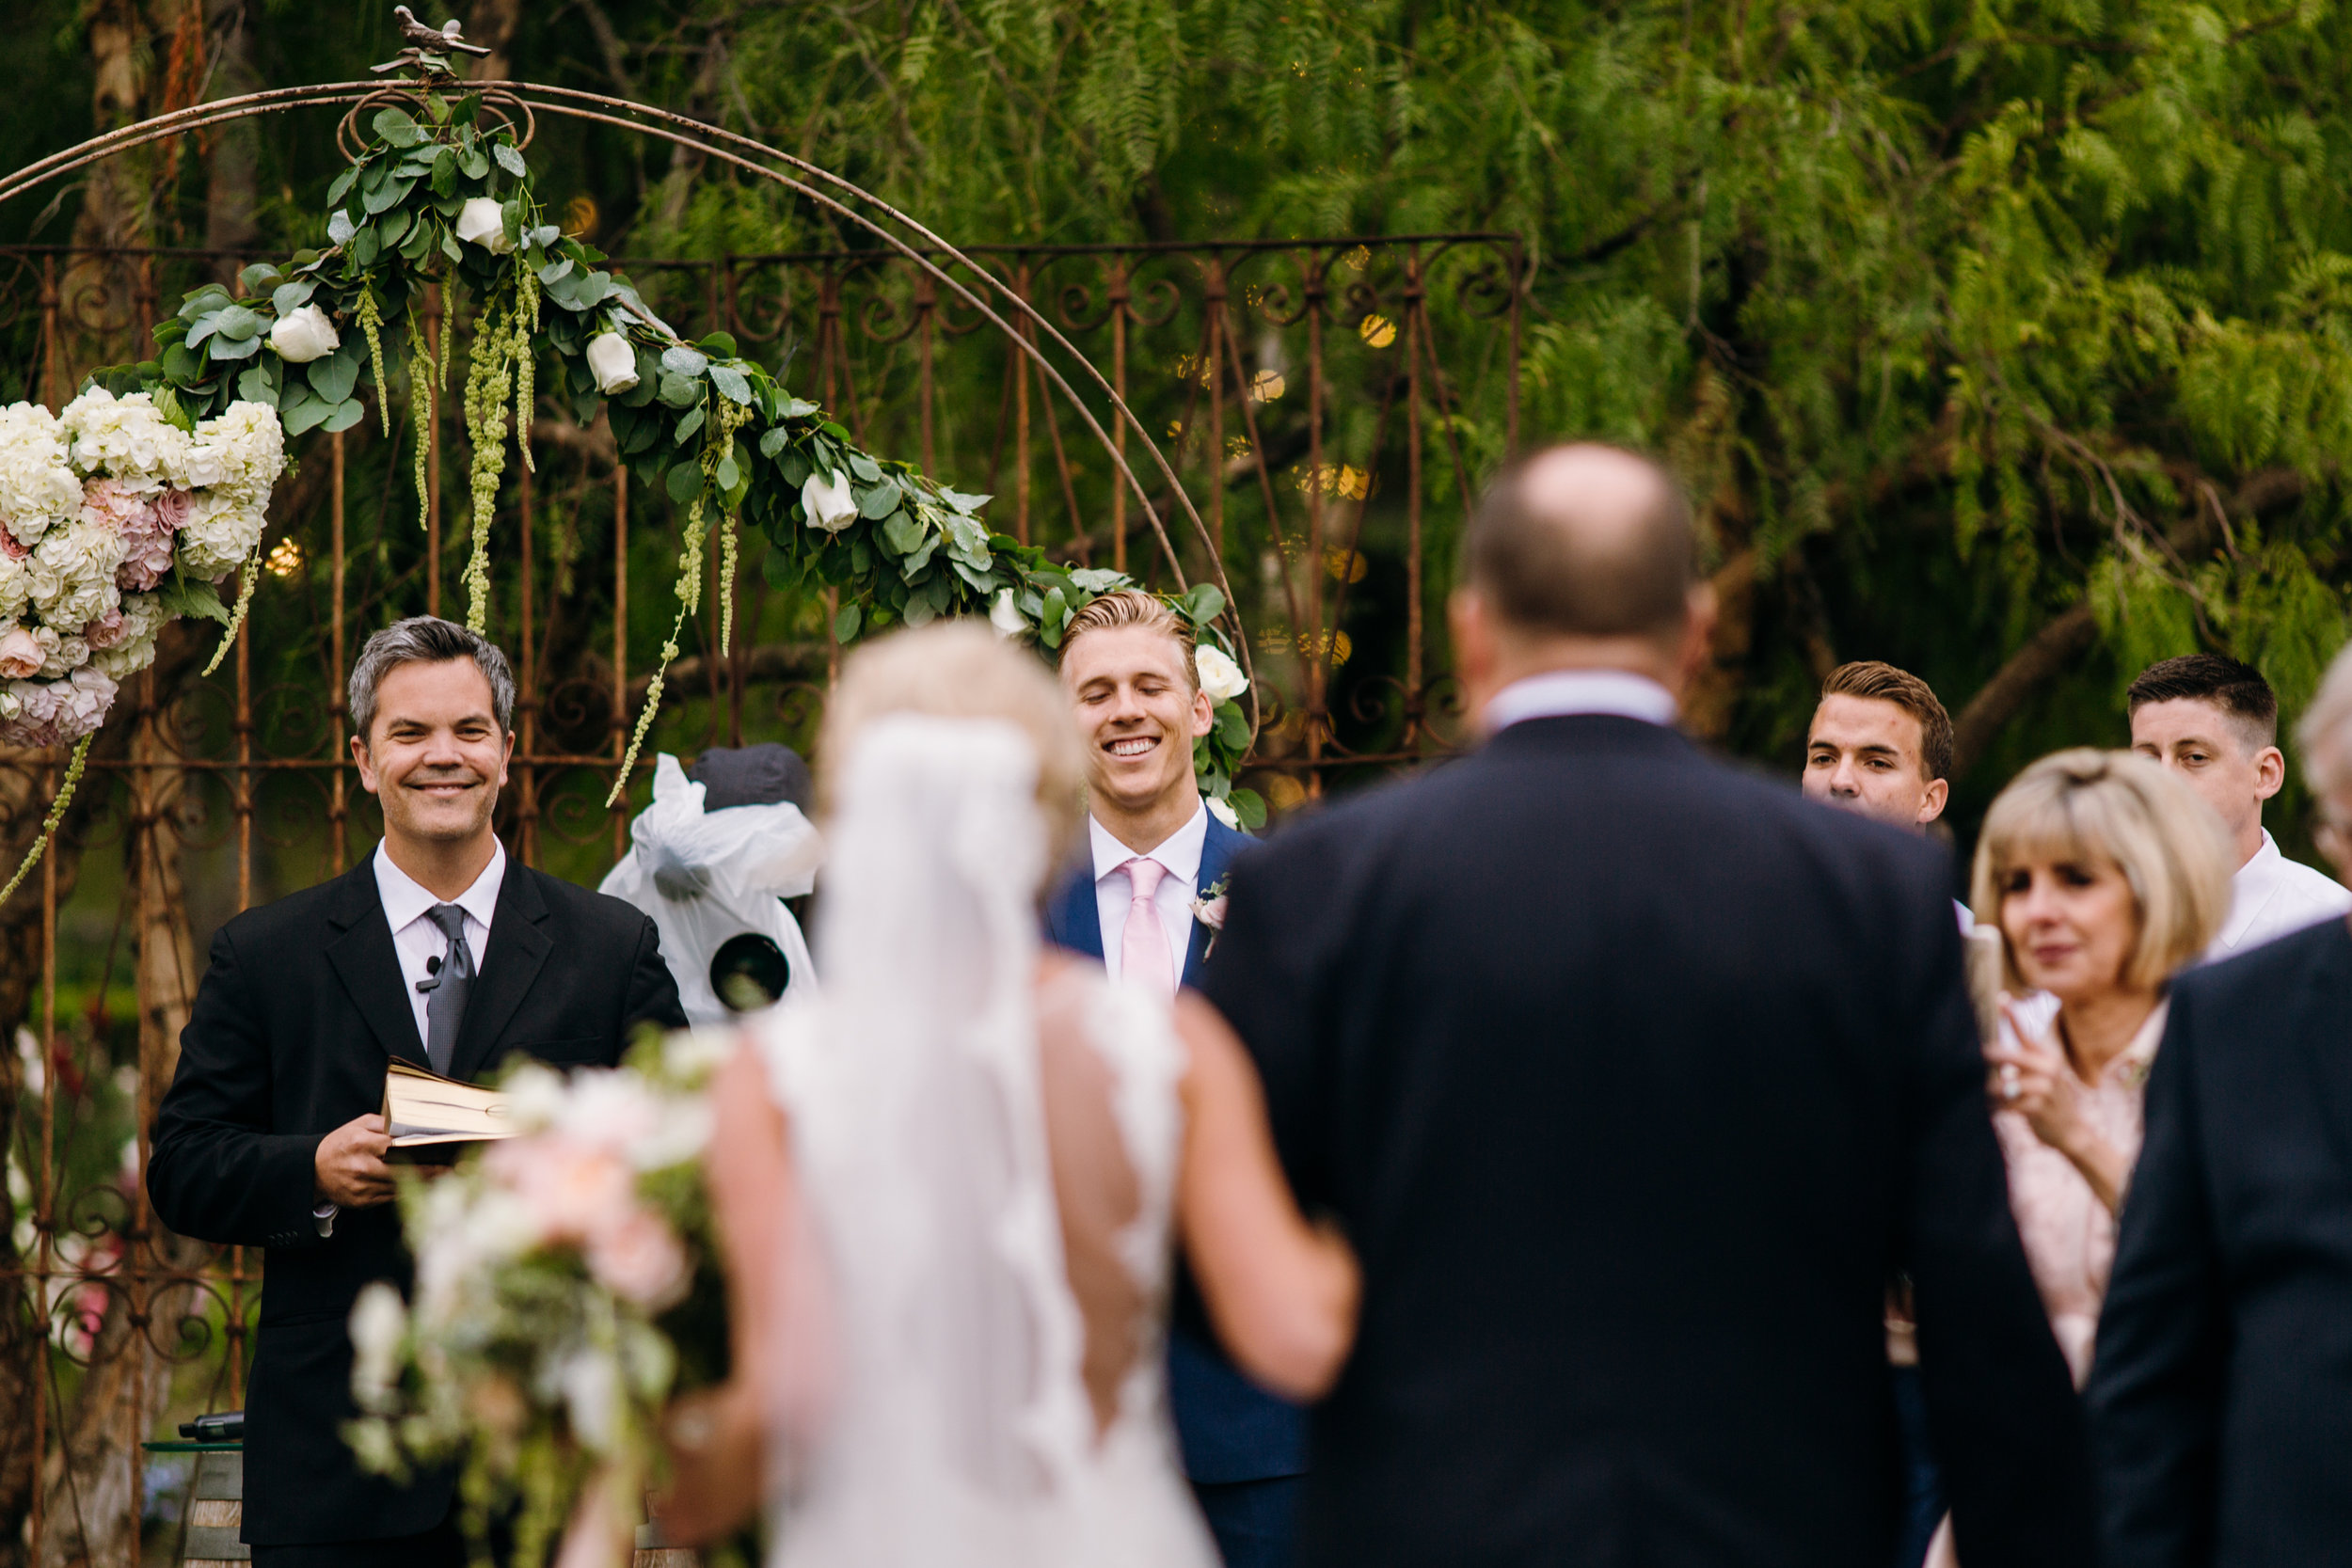 KaraNixonWeddings-LakeOakMeadows-Temecula-Wedding-30.jpg